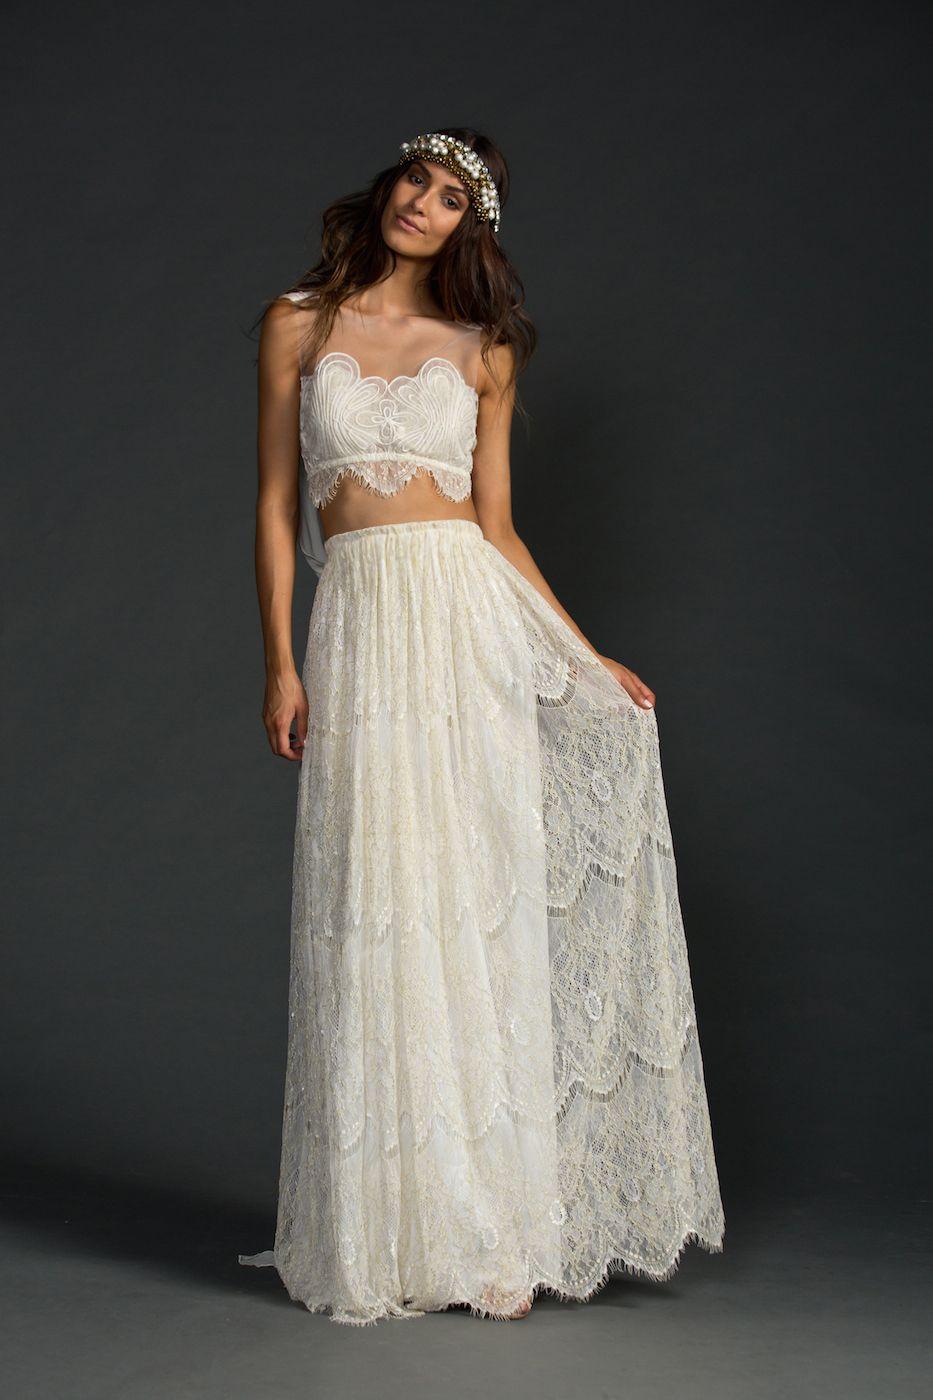 Avril Grace Loves Lace Two piece wedding dress